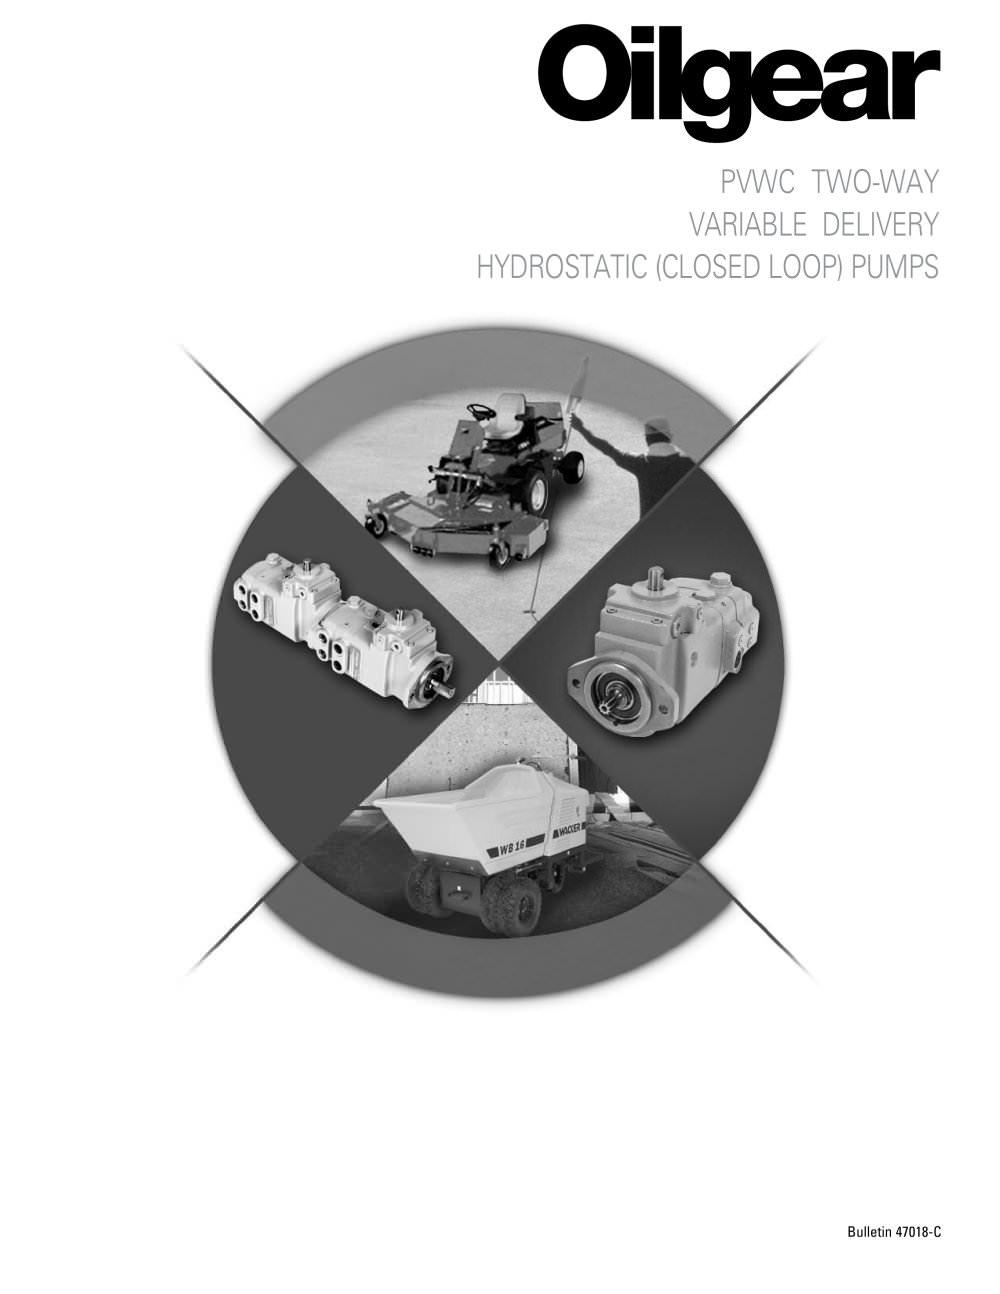 PVWC 011, 014, 022 Pump - Oilgear - PDF Catalogue   Technical ...